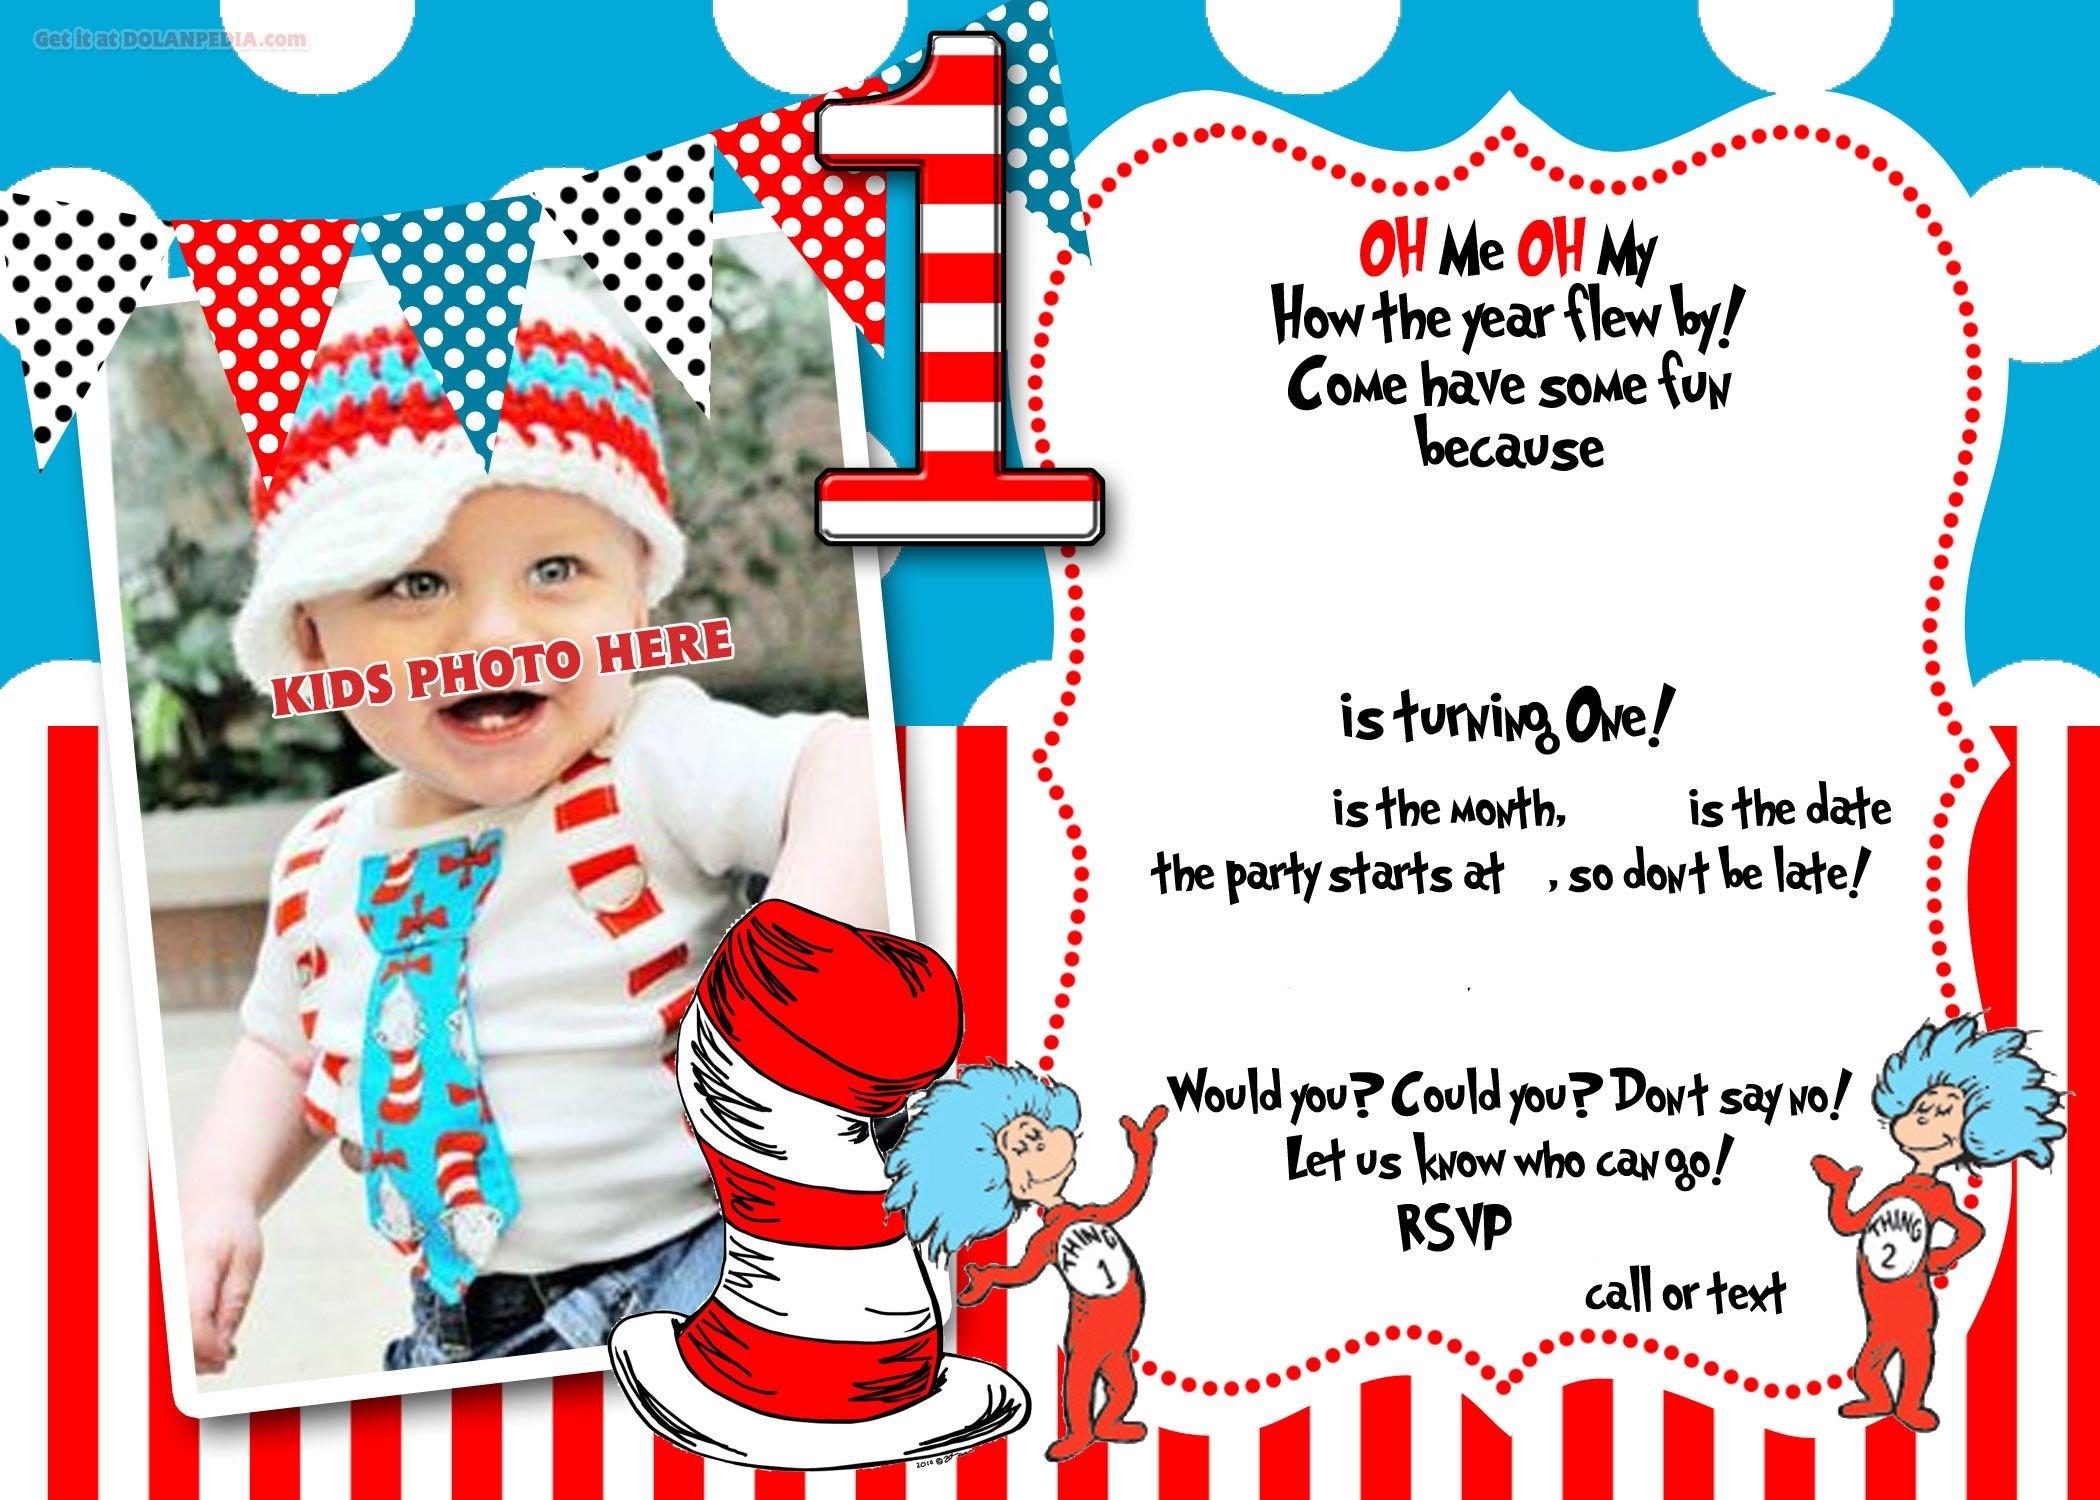 Drseuss St Birthday Invitation Template  Party Ideas  St For Dr Seuss Birthday Card Template